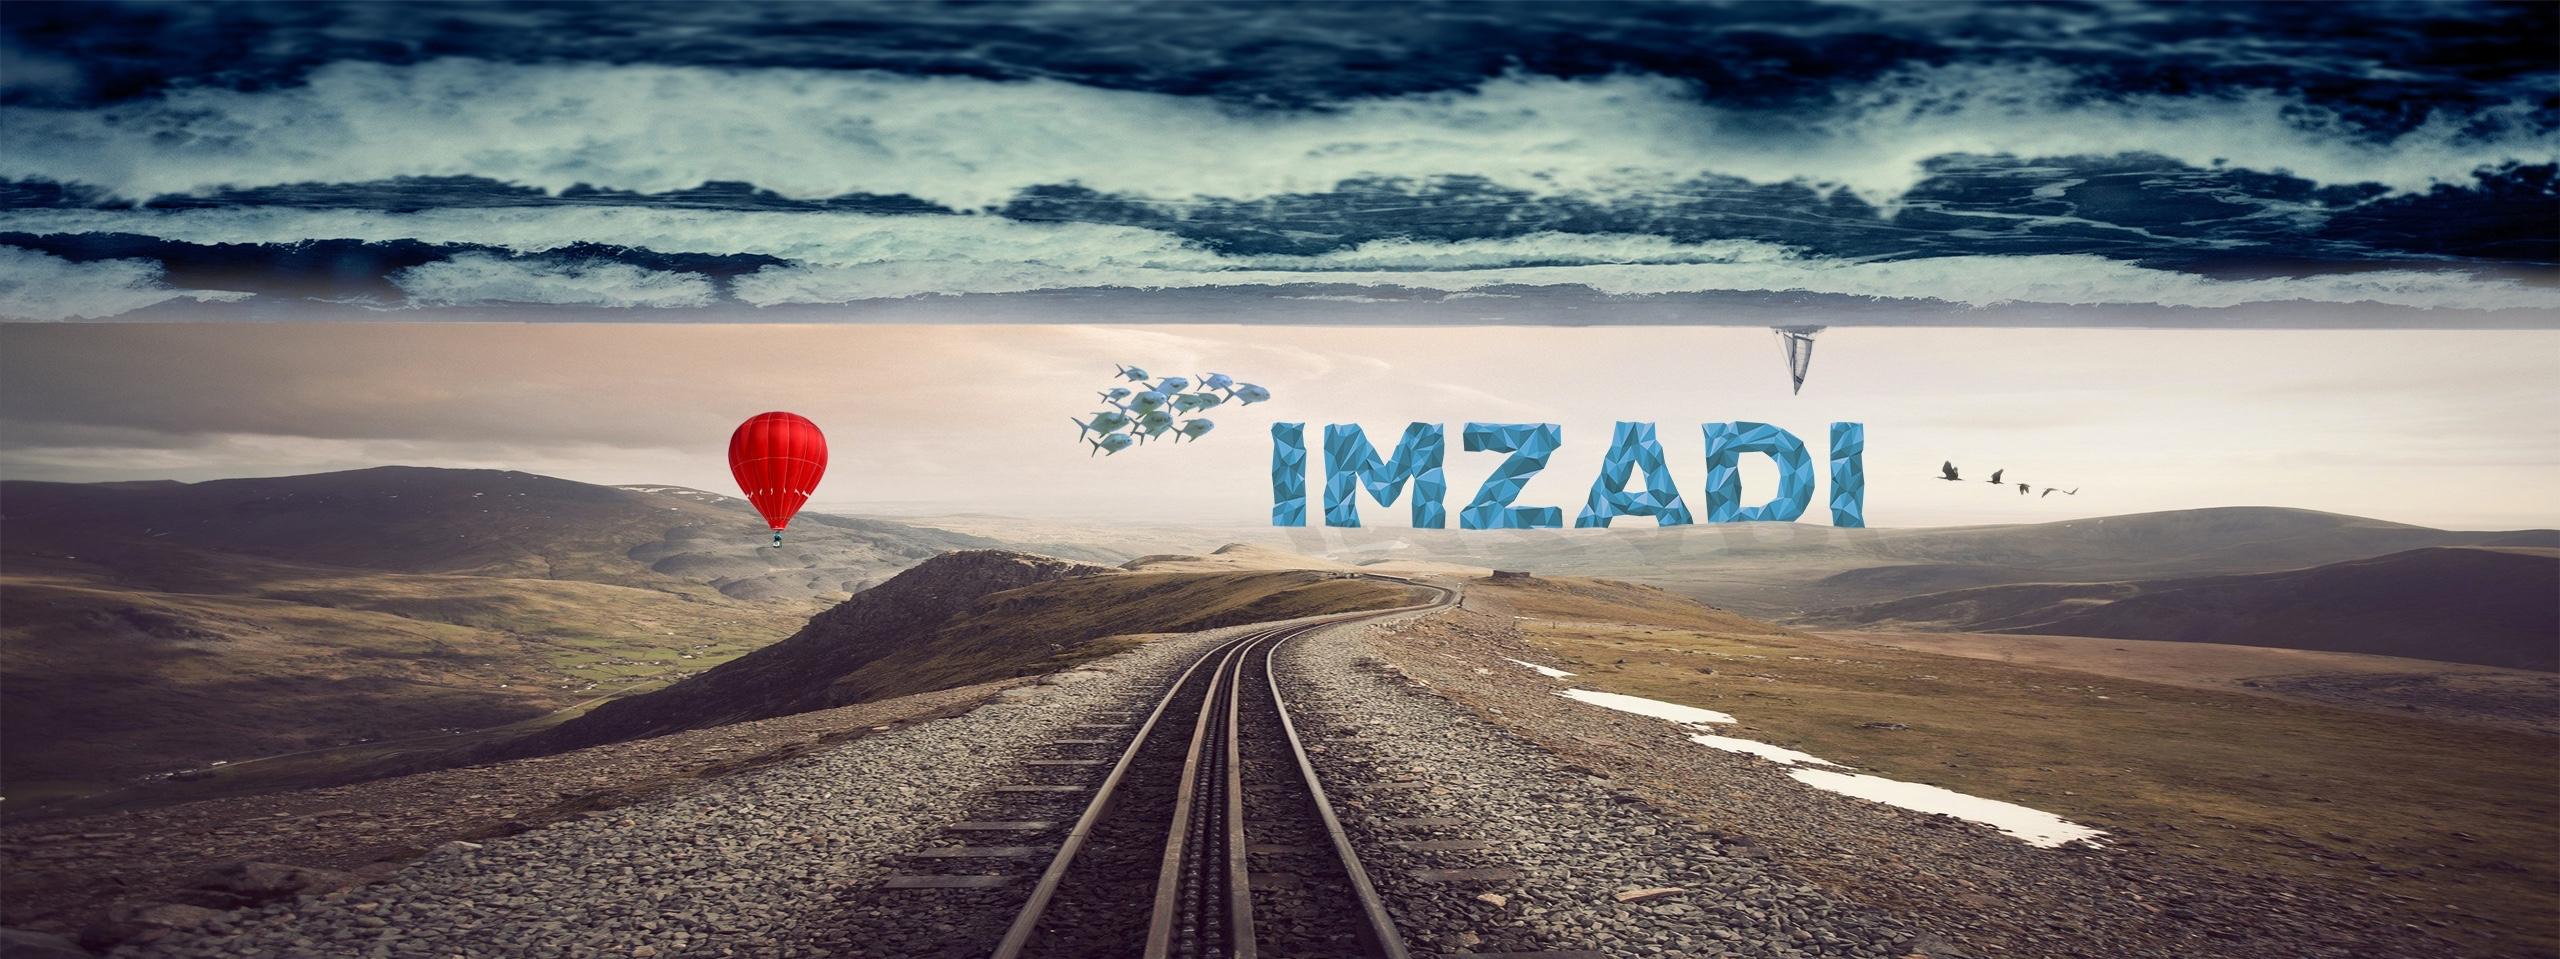 Yasmeen (@yshaban) Cover Image